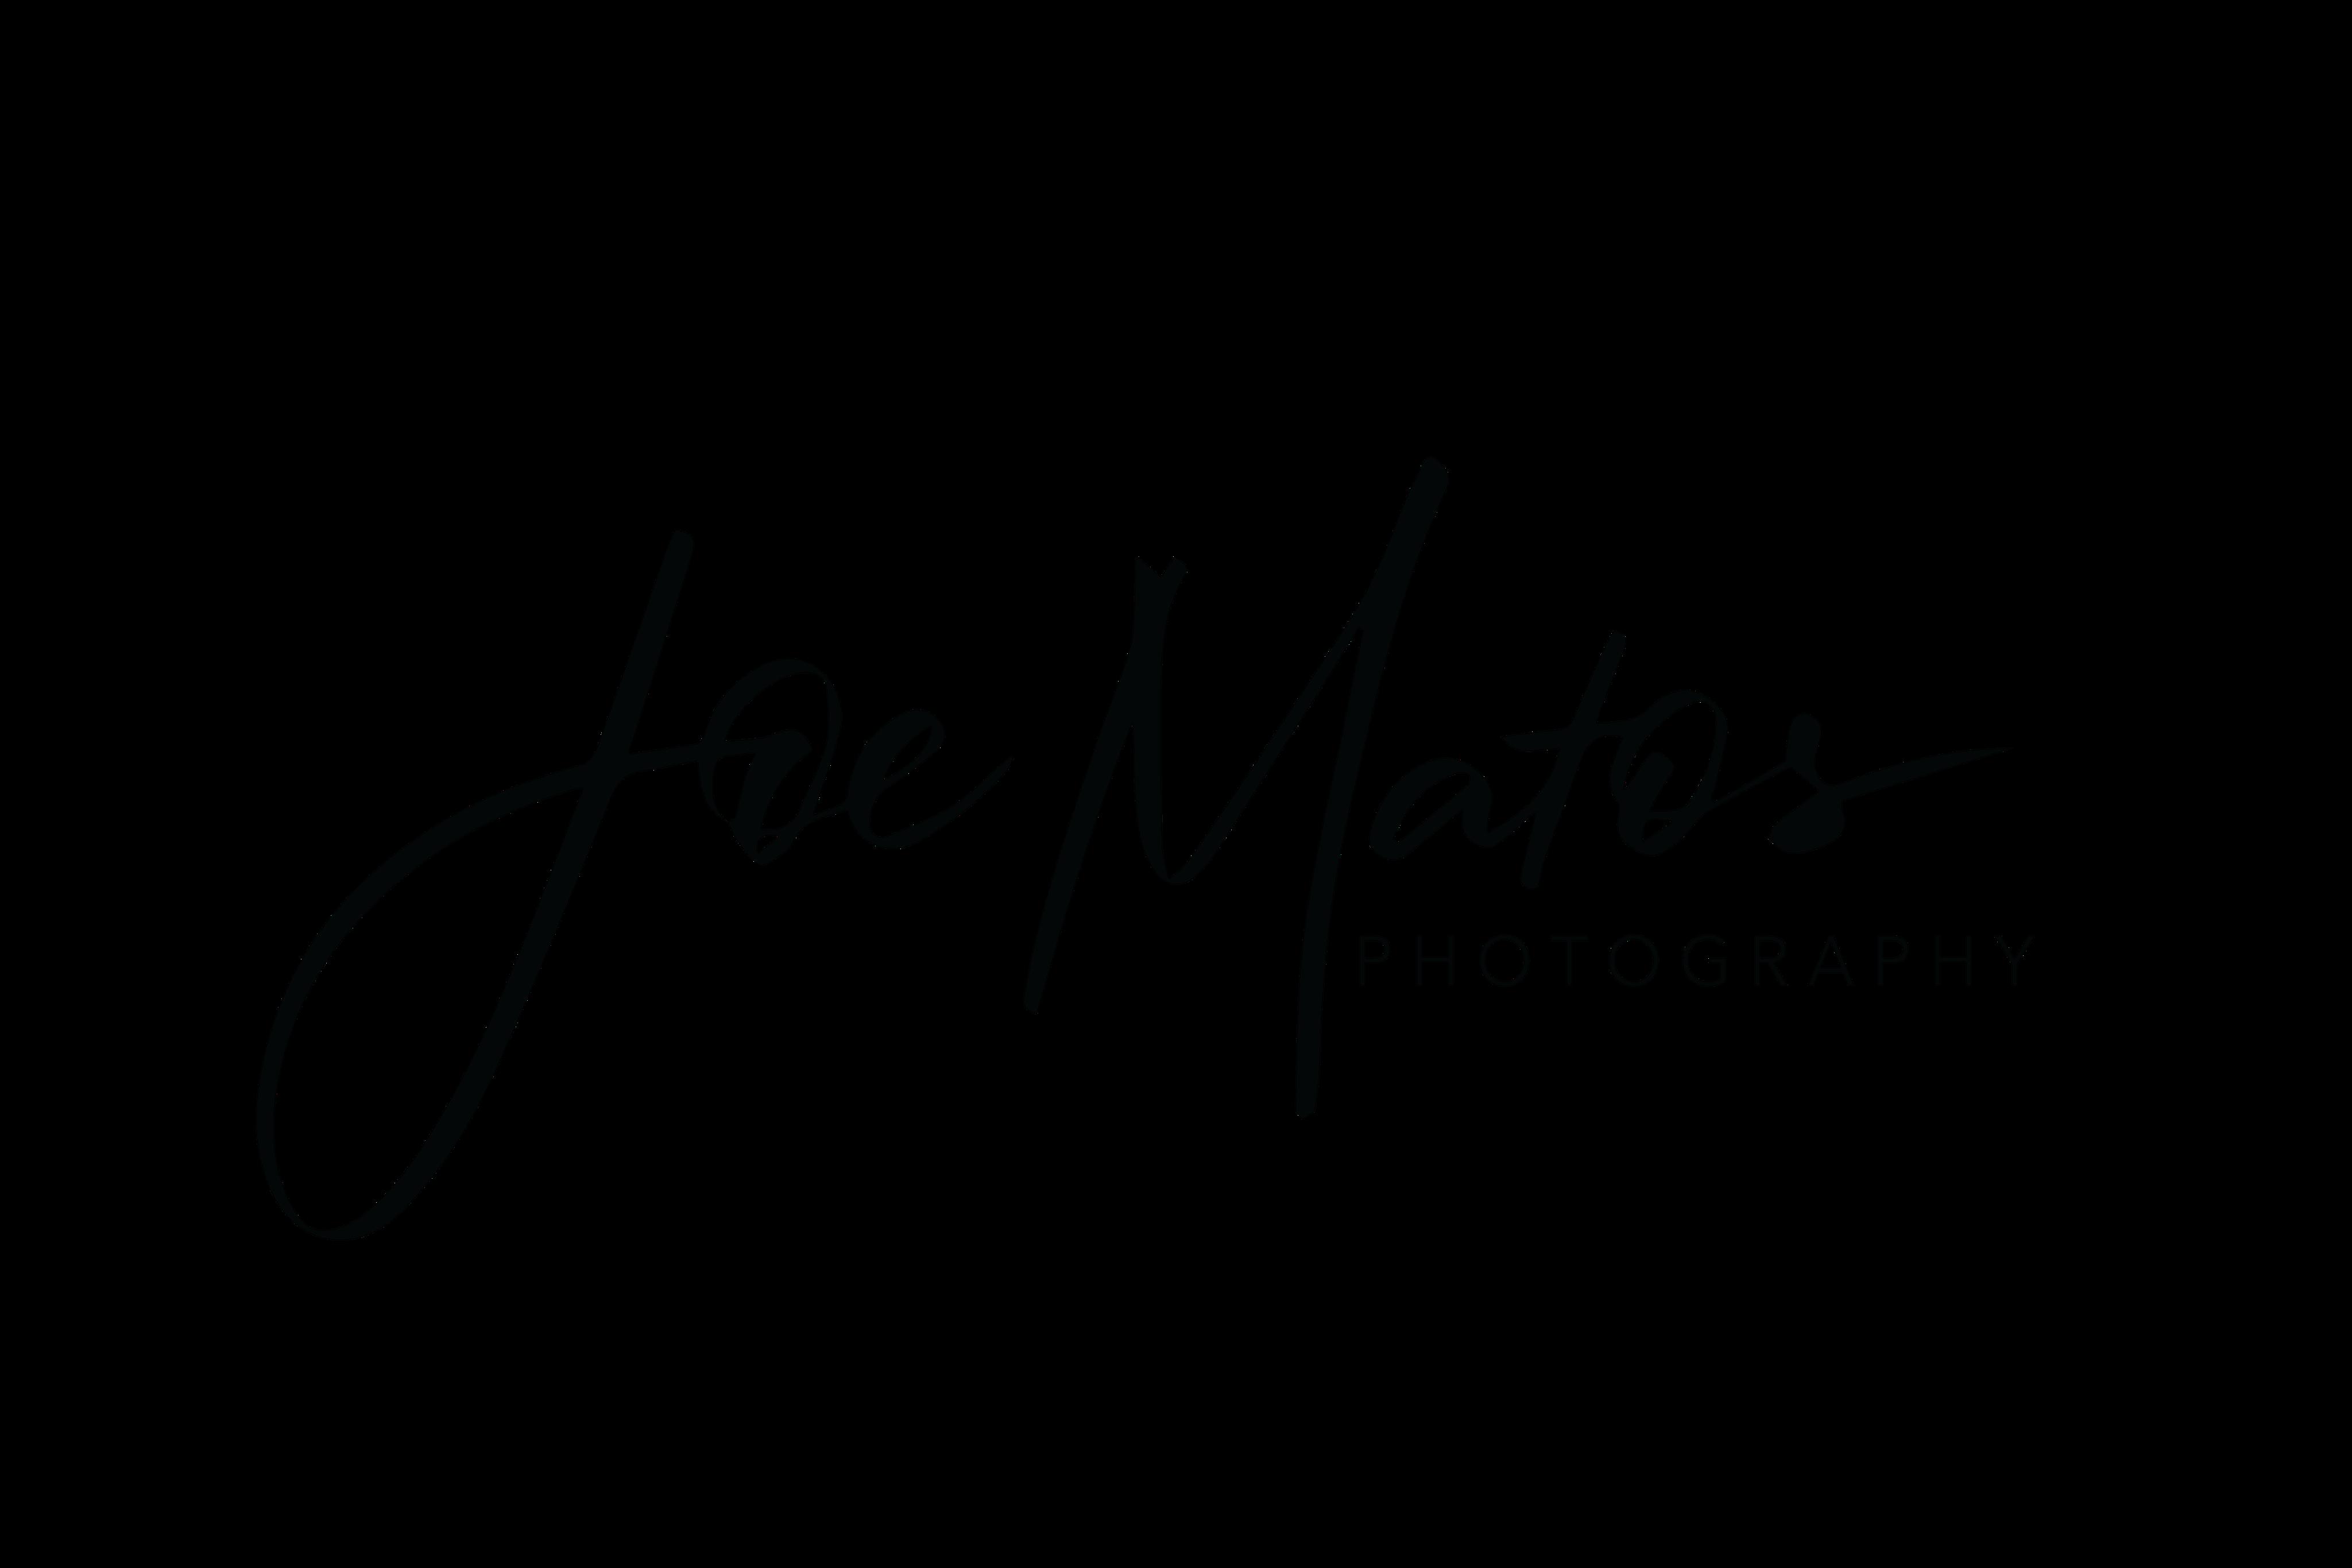 Joseph Matos